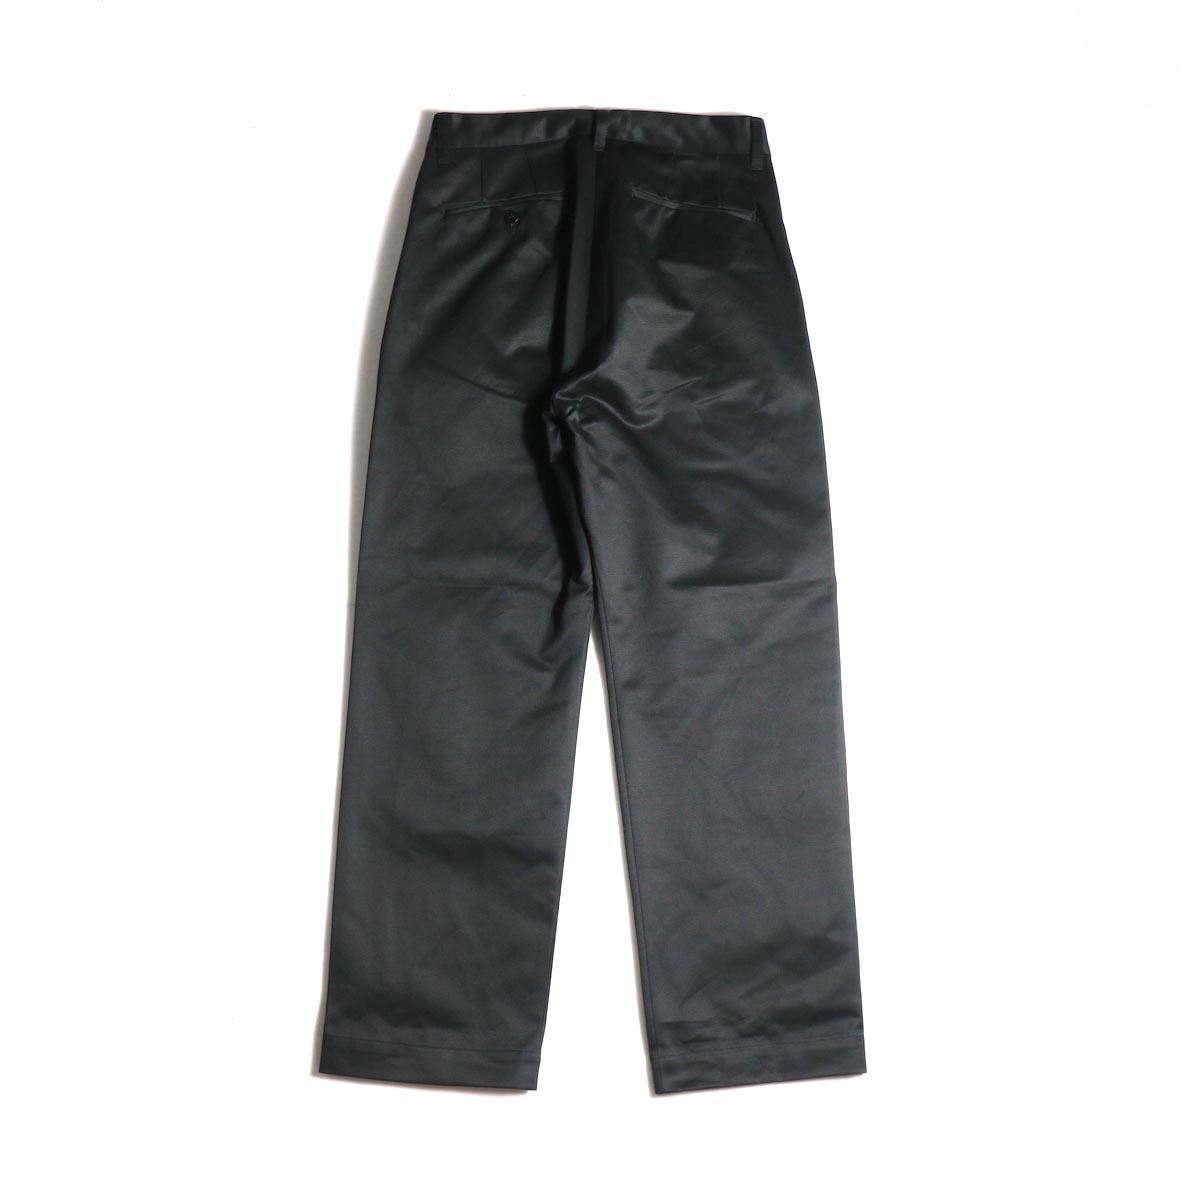 FUTURE PRIMITIVE / FP FZ CHINO PANTS (Black)背面